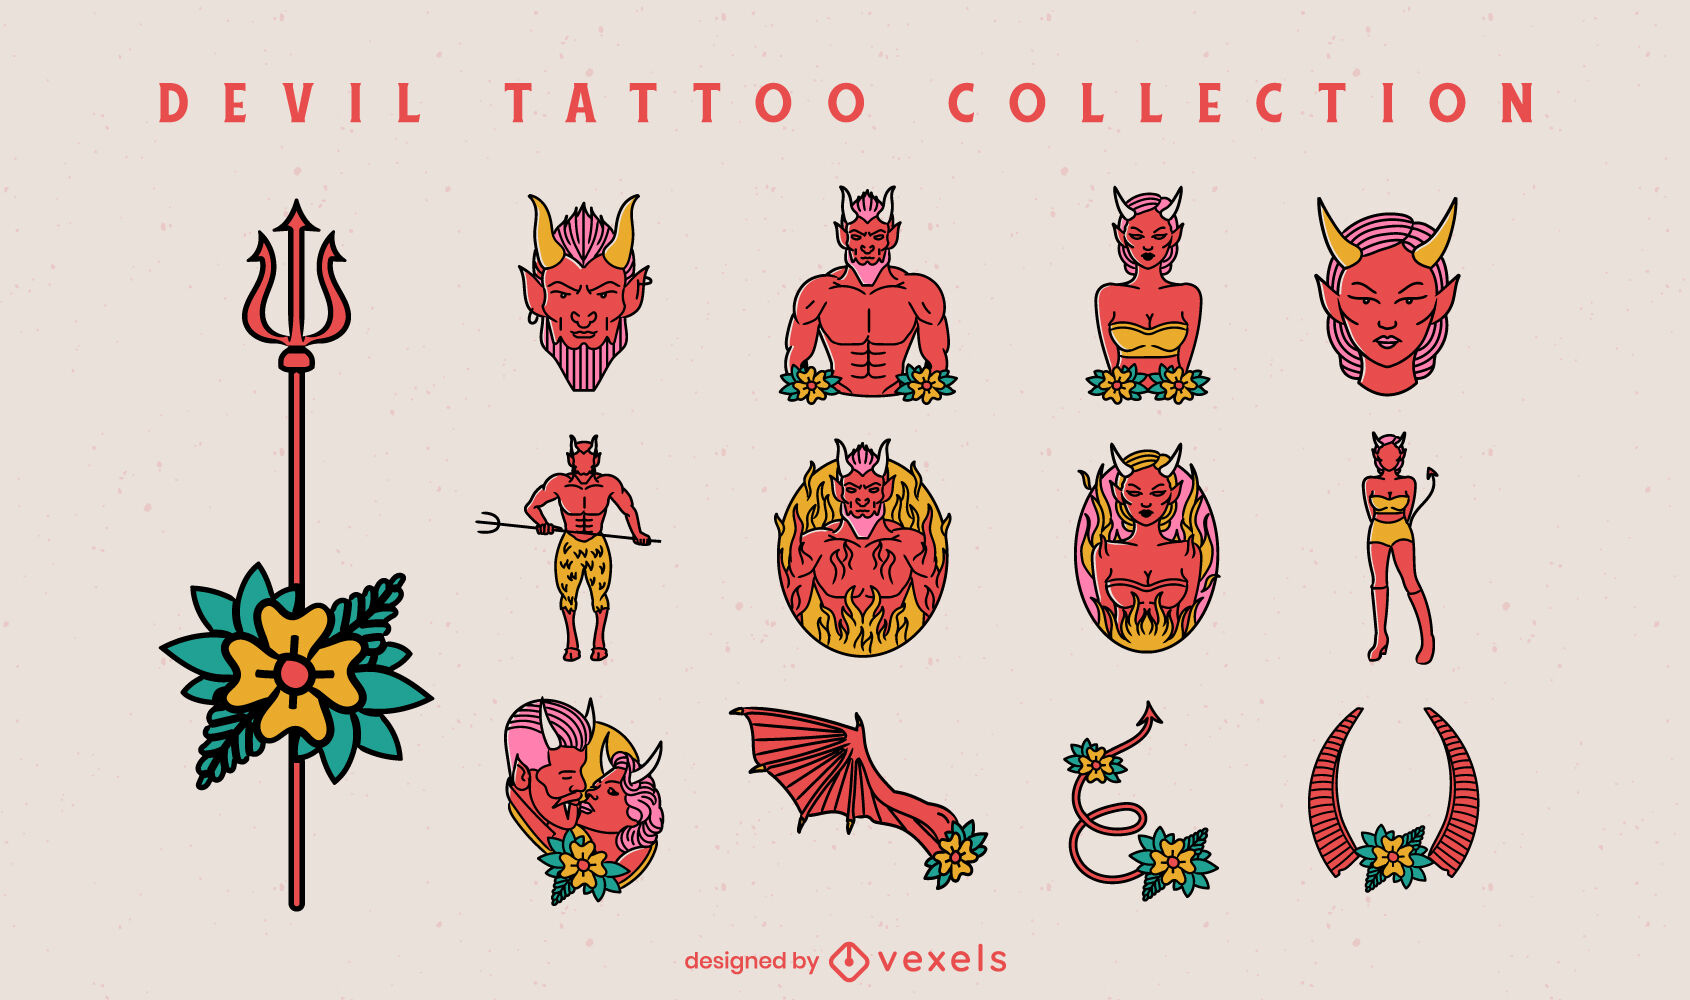 Devil tattoo set of characters